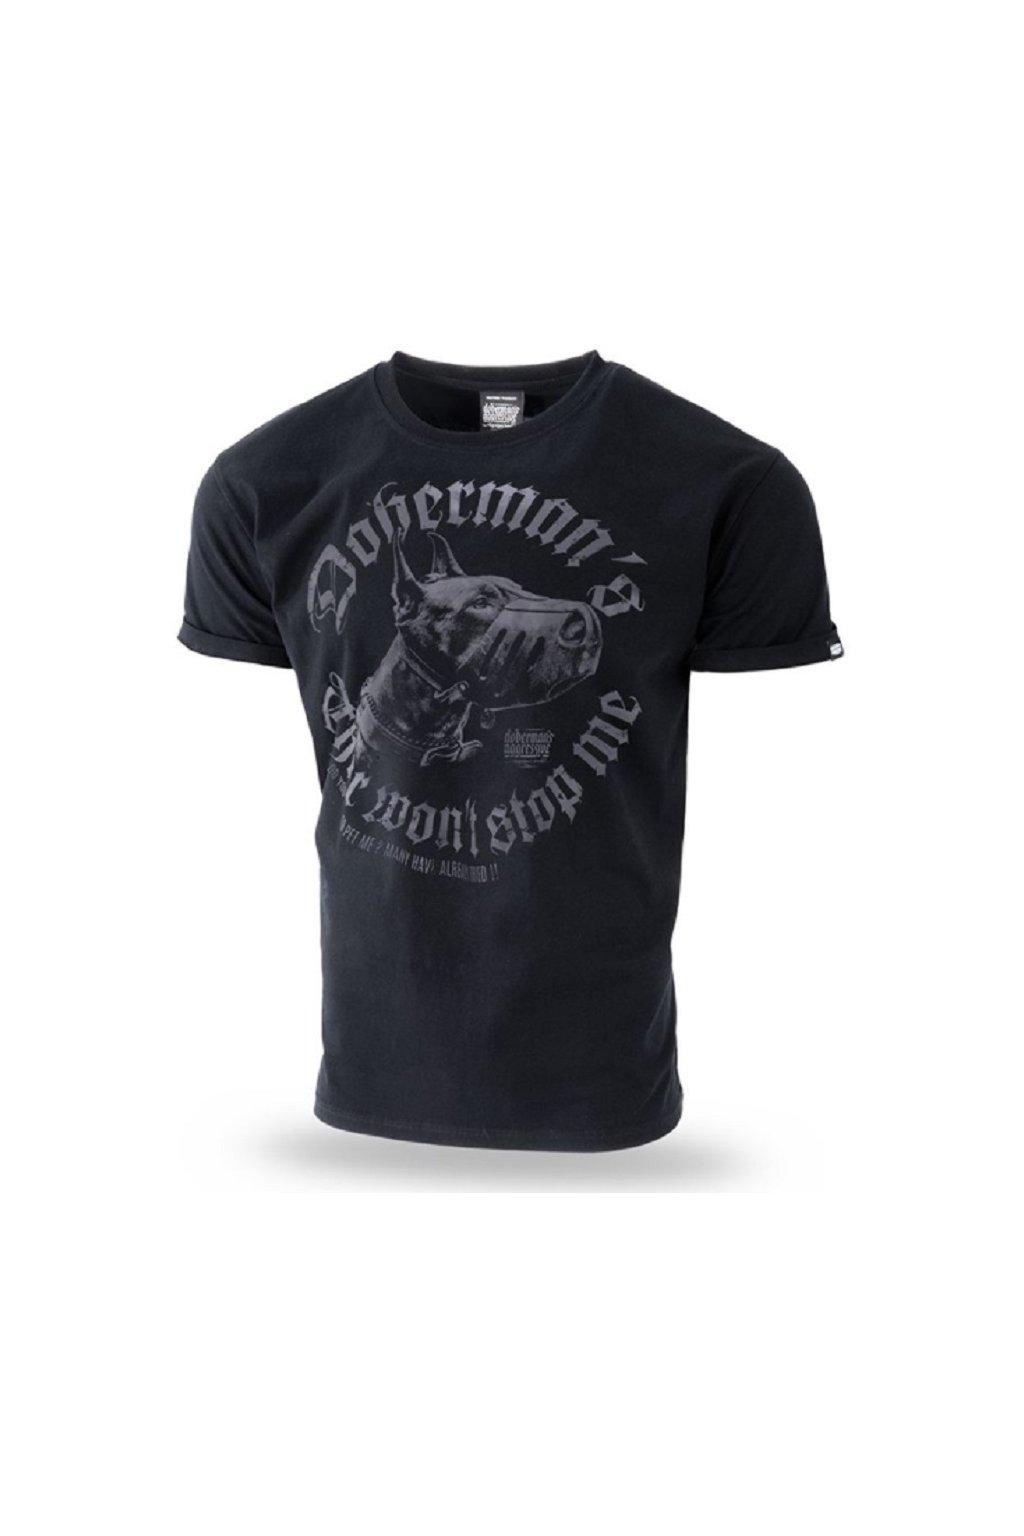 Dobermans Aggressive triko DDANGEROUS DOG černá obr1